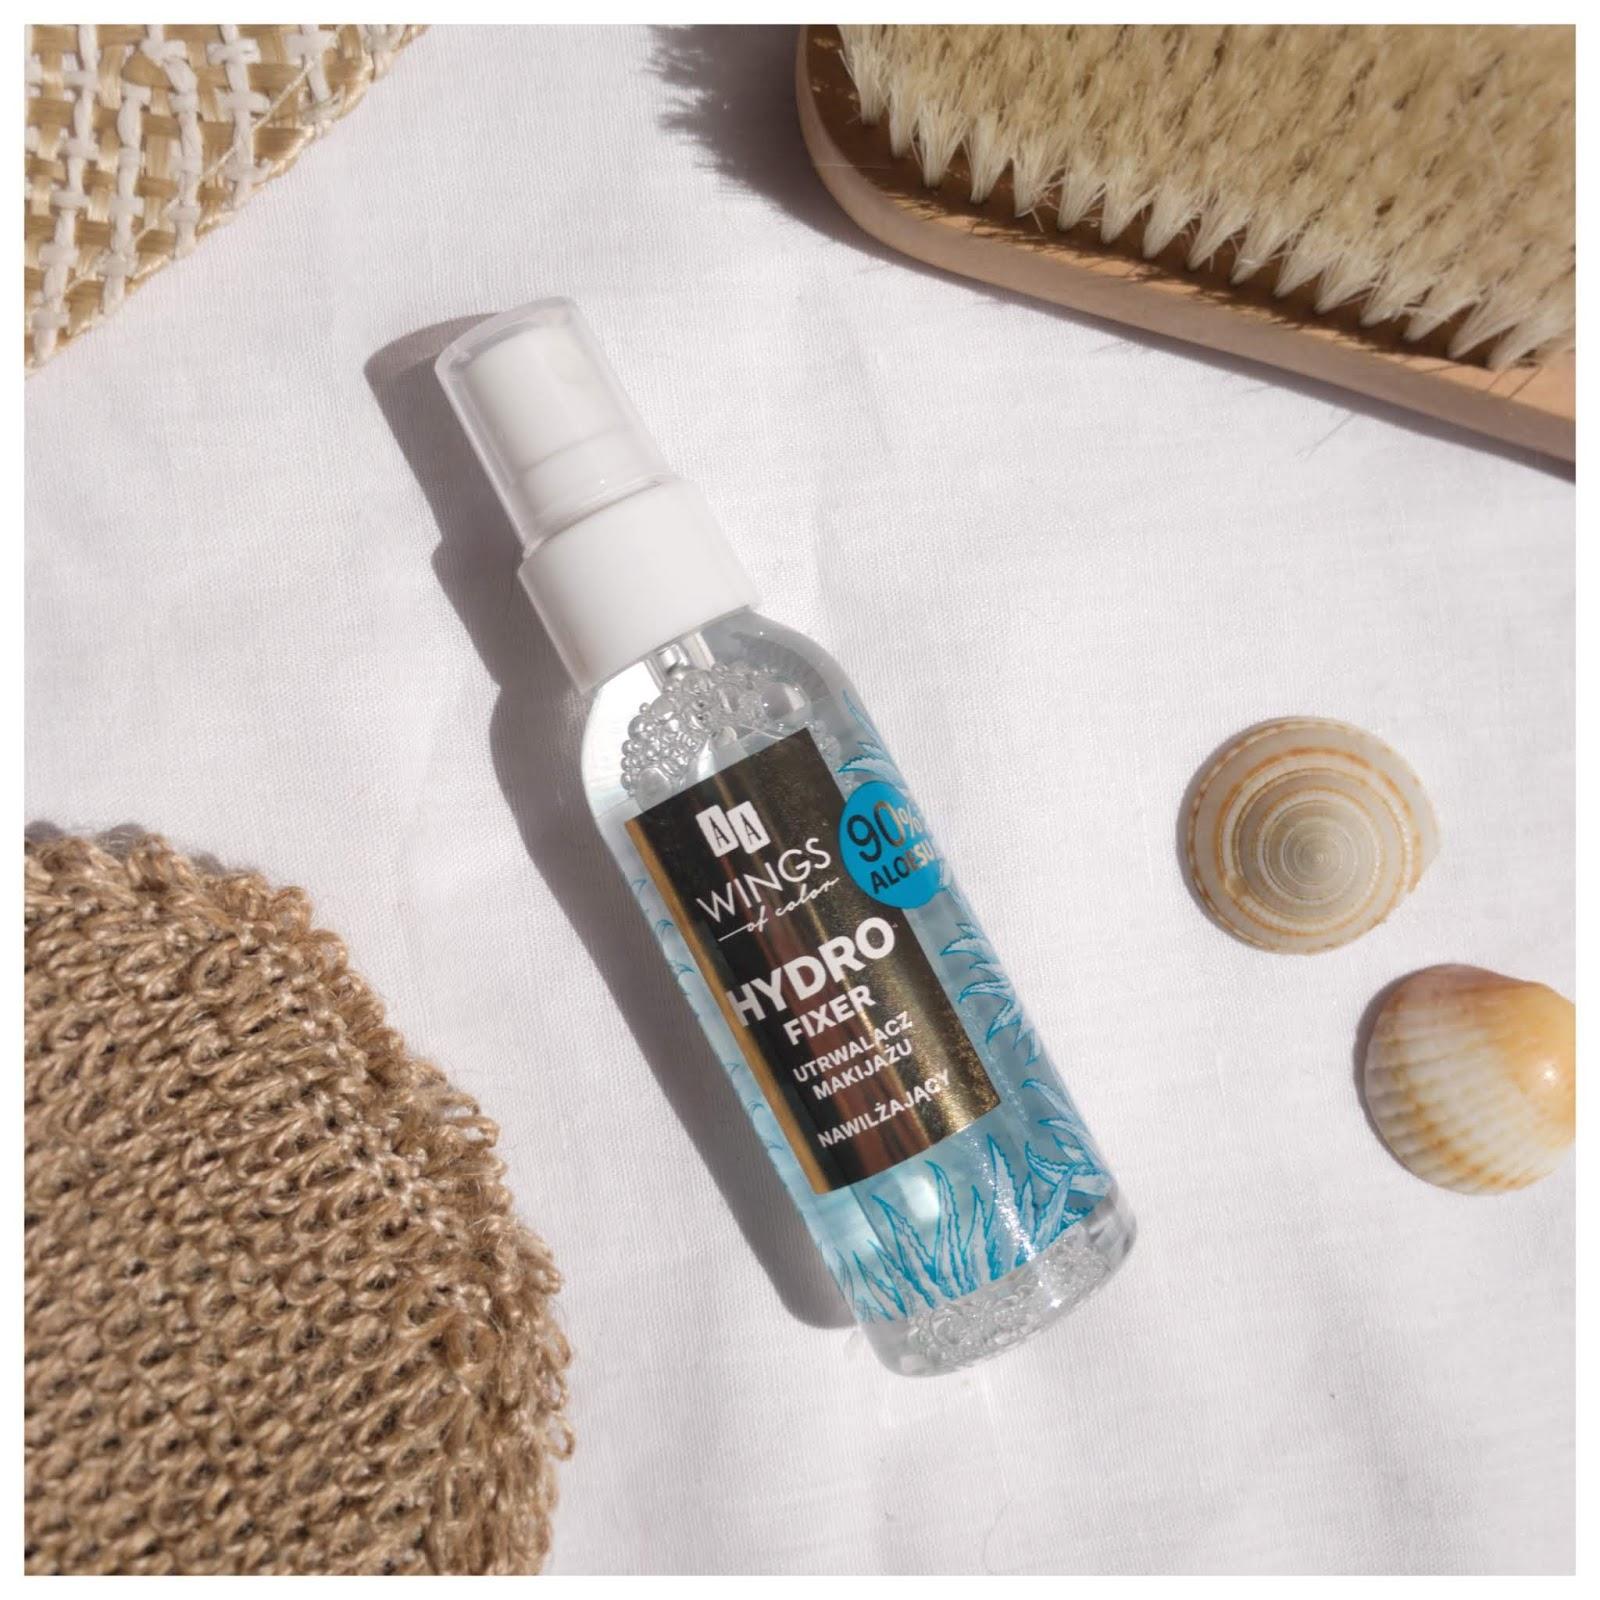 Glowy makeup mist from drugstore – AA Hydro Fixer | Vegan & Cruelty-free